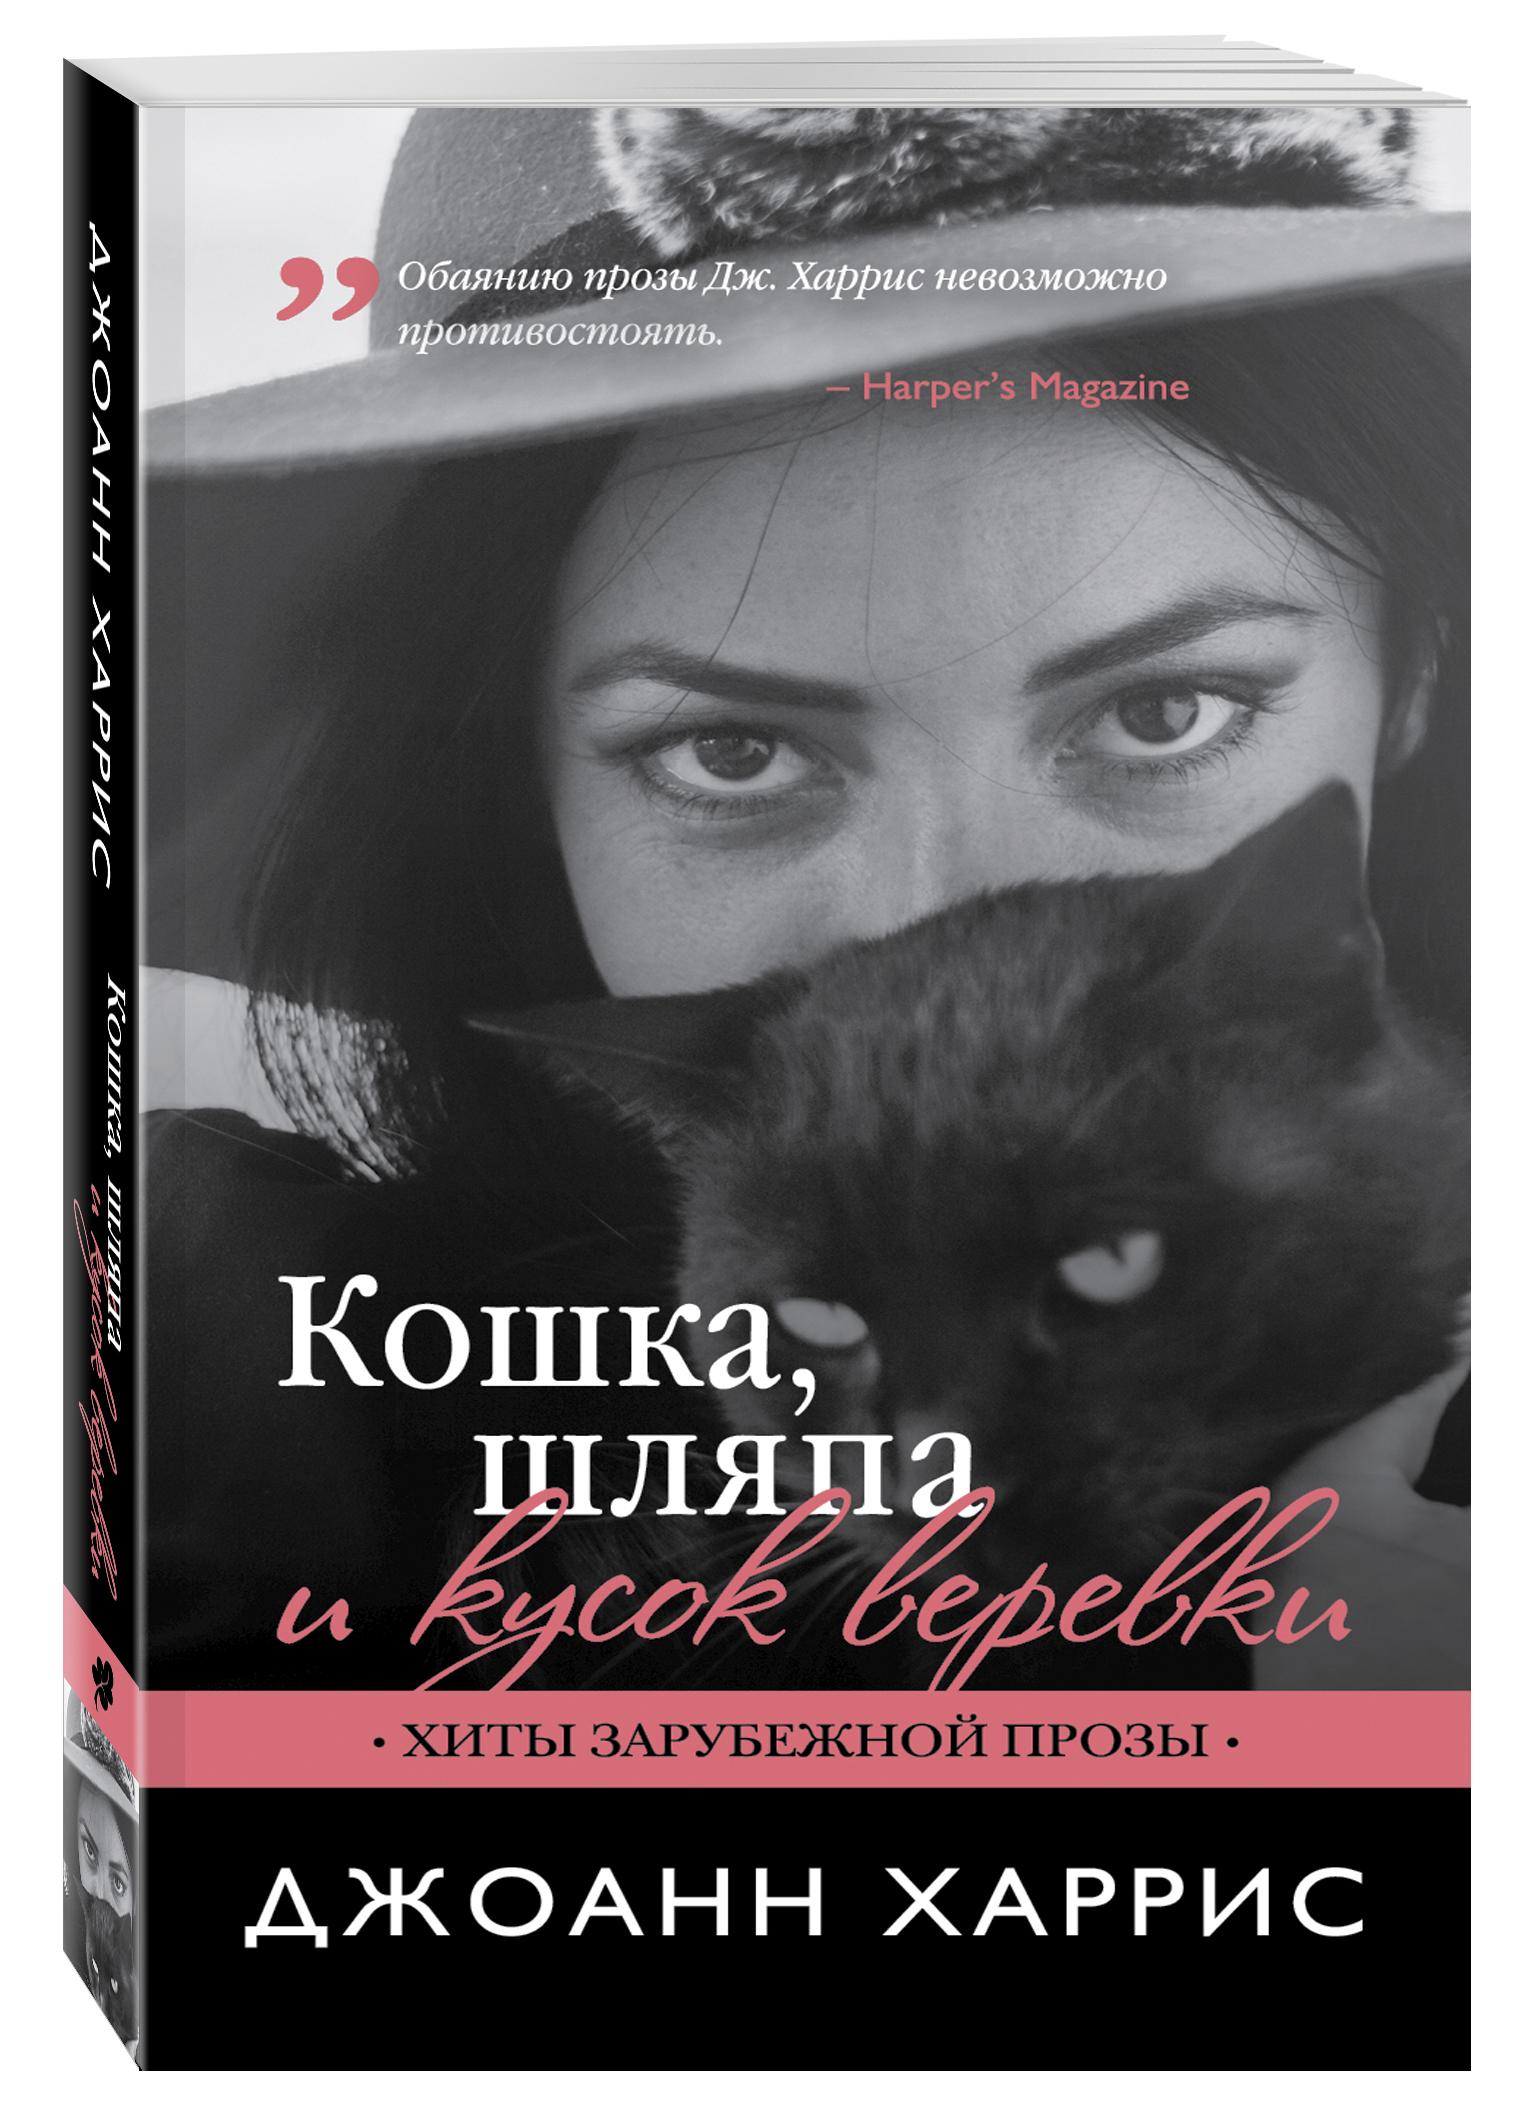 Харрис Дж. Кошка, шляпа и кусок веревки ISBN: 978-5-699-94784-3 харрис джоанн темный ангел